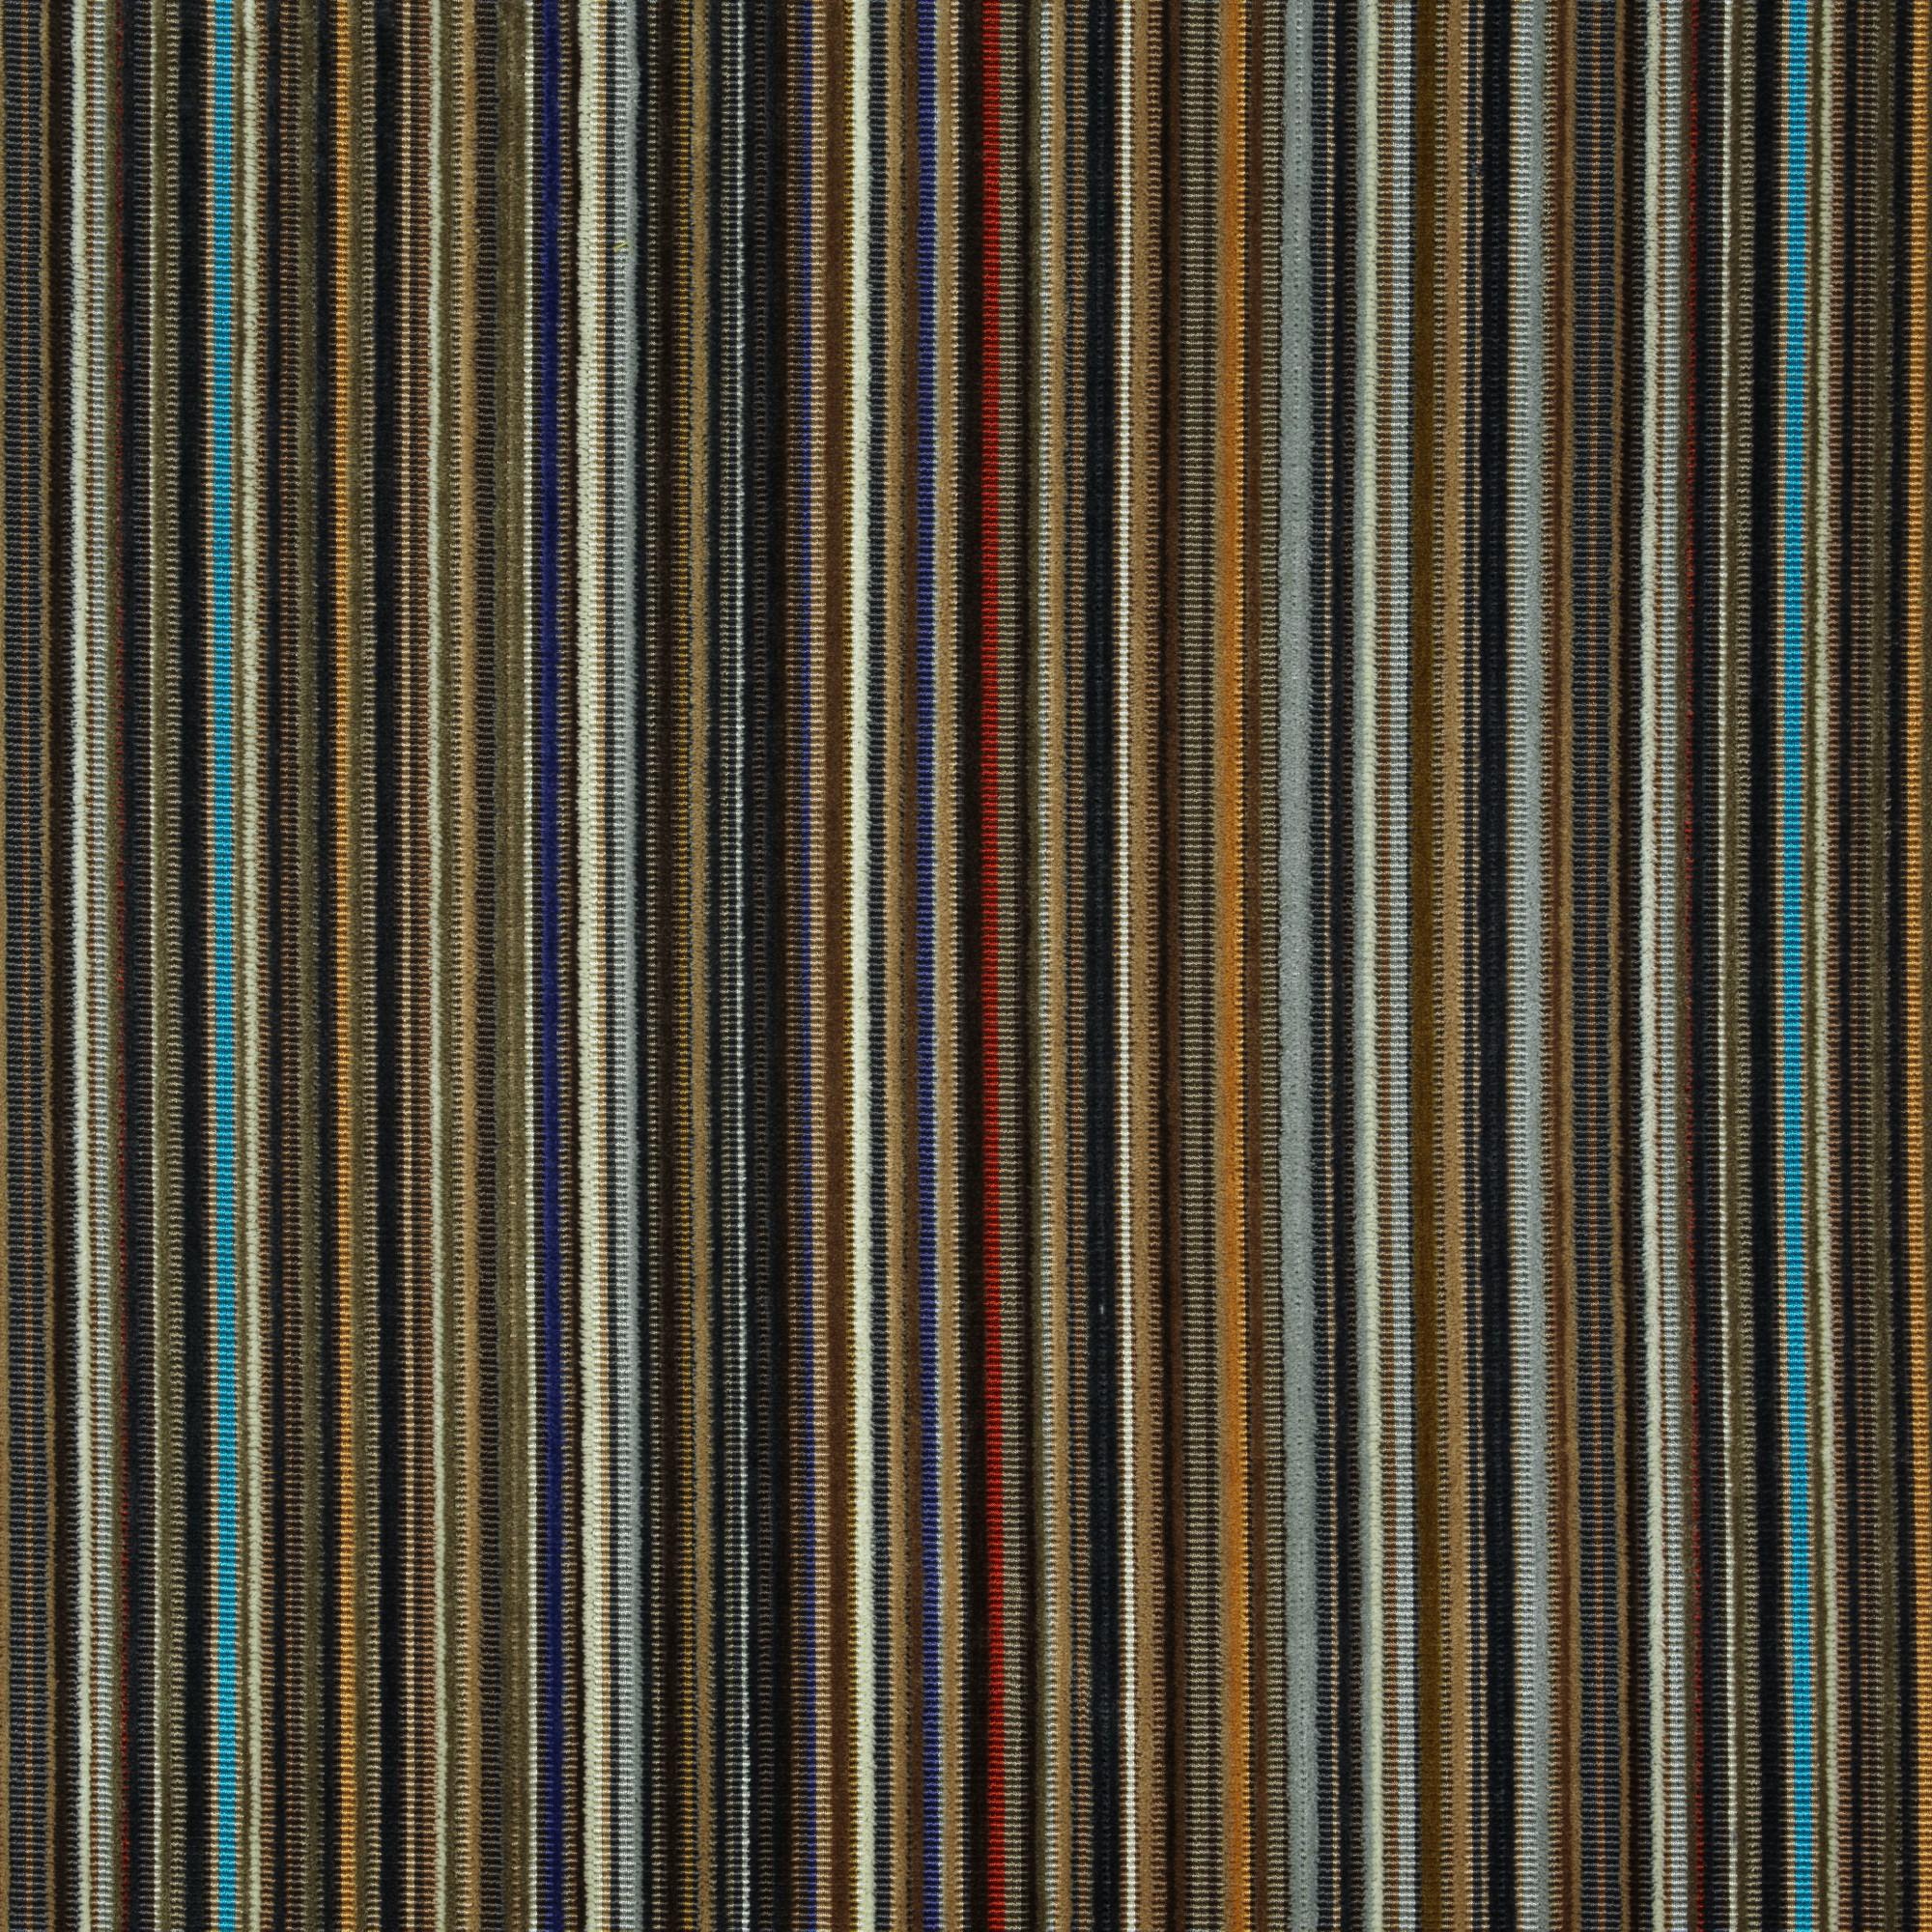 Connu Paul Smith Designer Fabric Stockist - London Fabric Company UK JK44